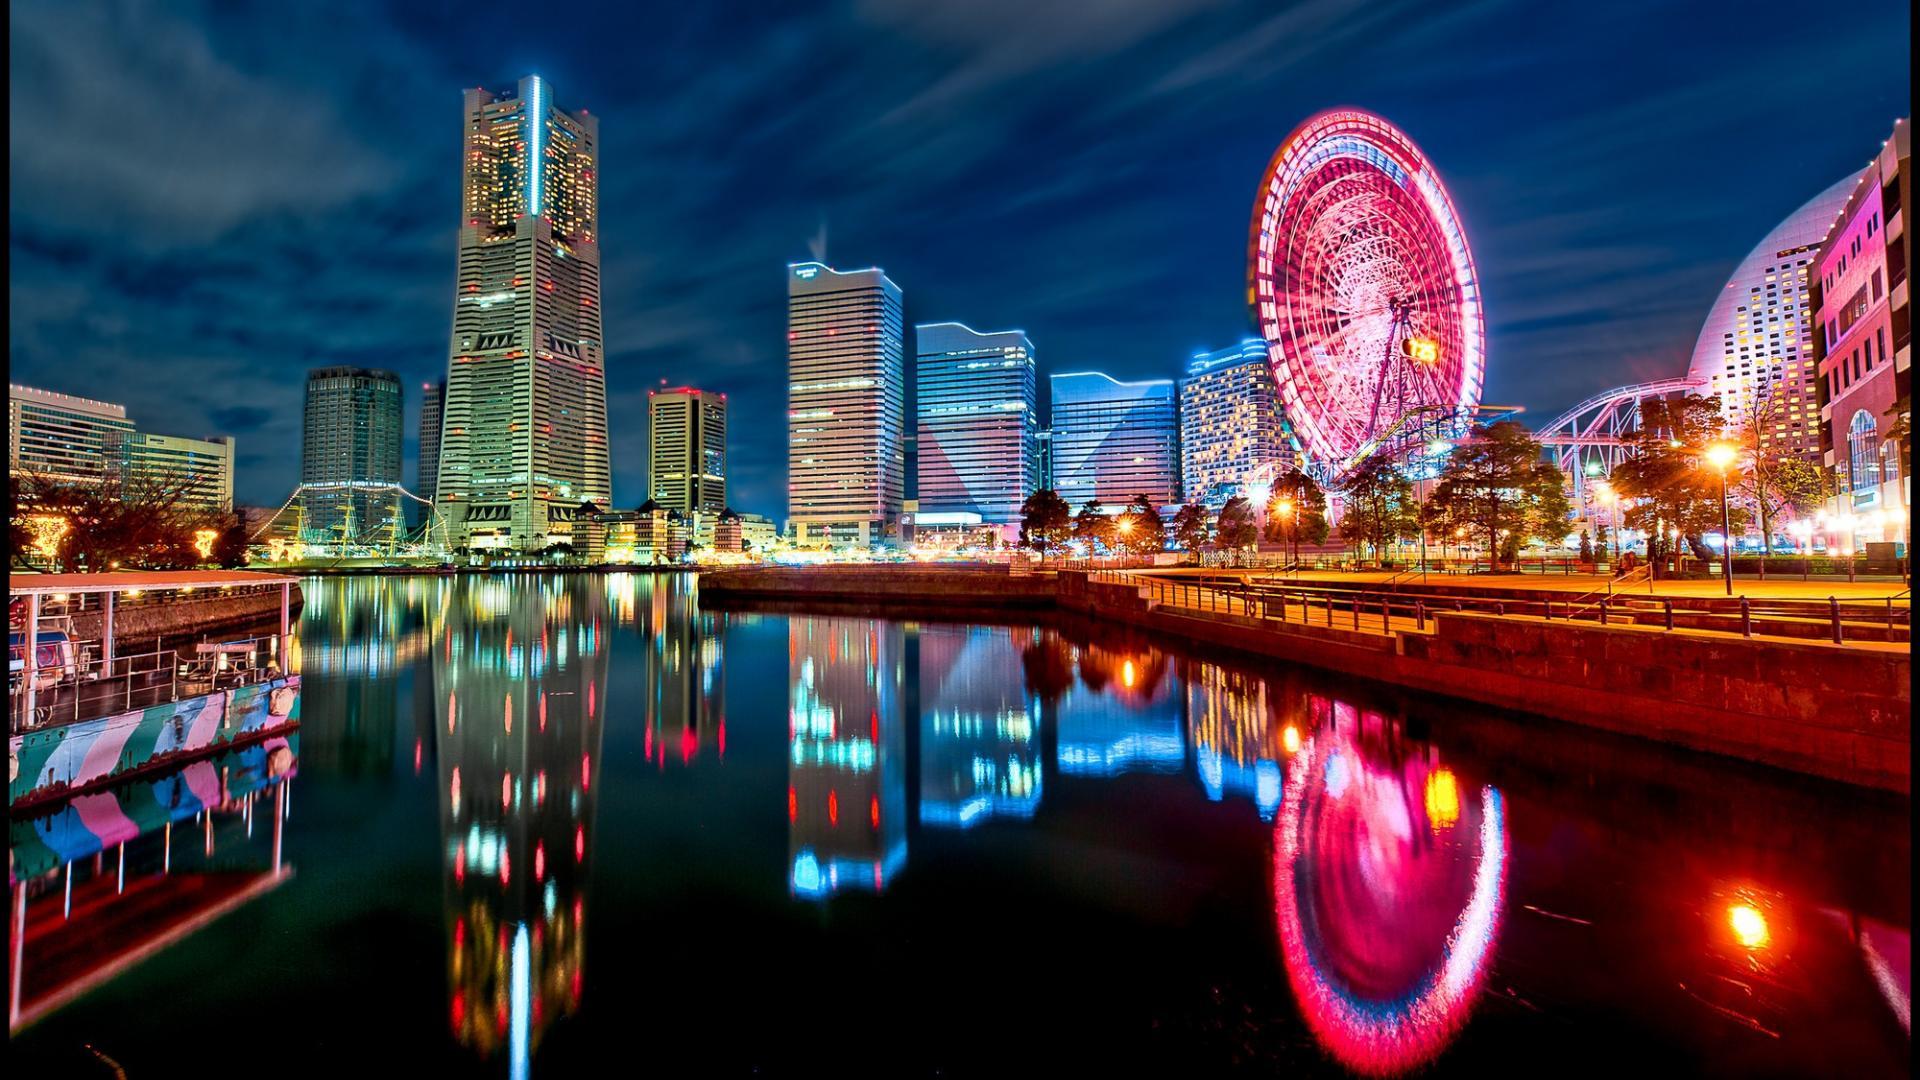 Japan tokyo cityscapes yokohama city lights bay wallpaper 16155 1920x1080